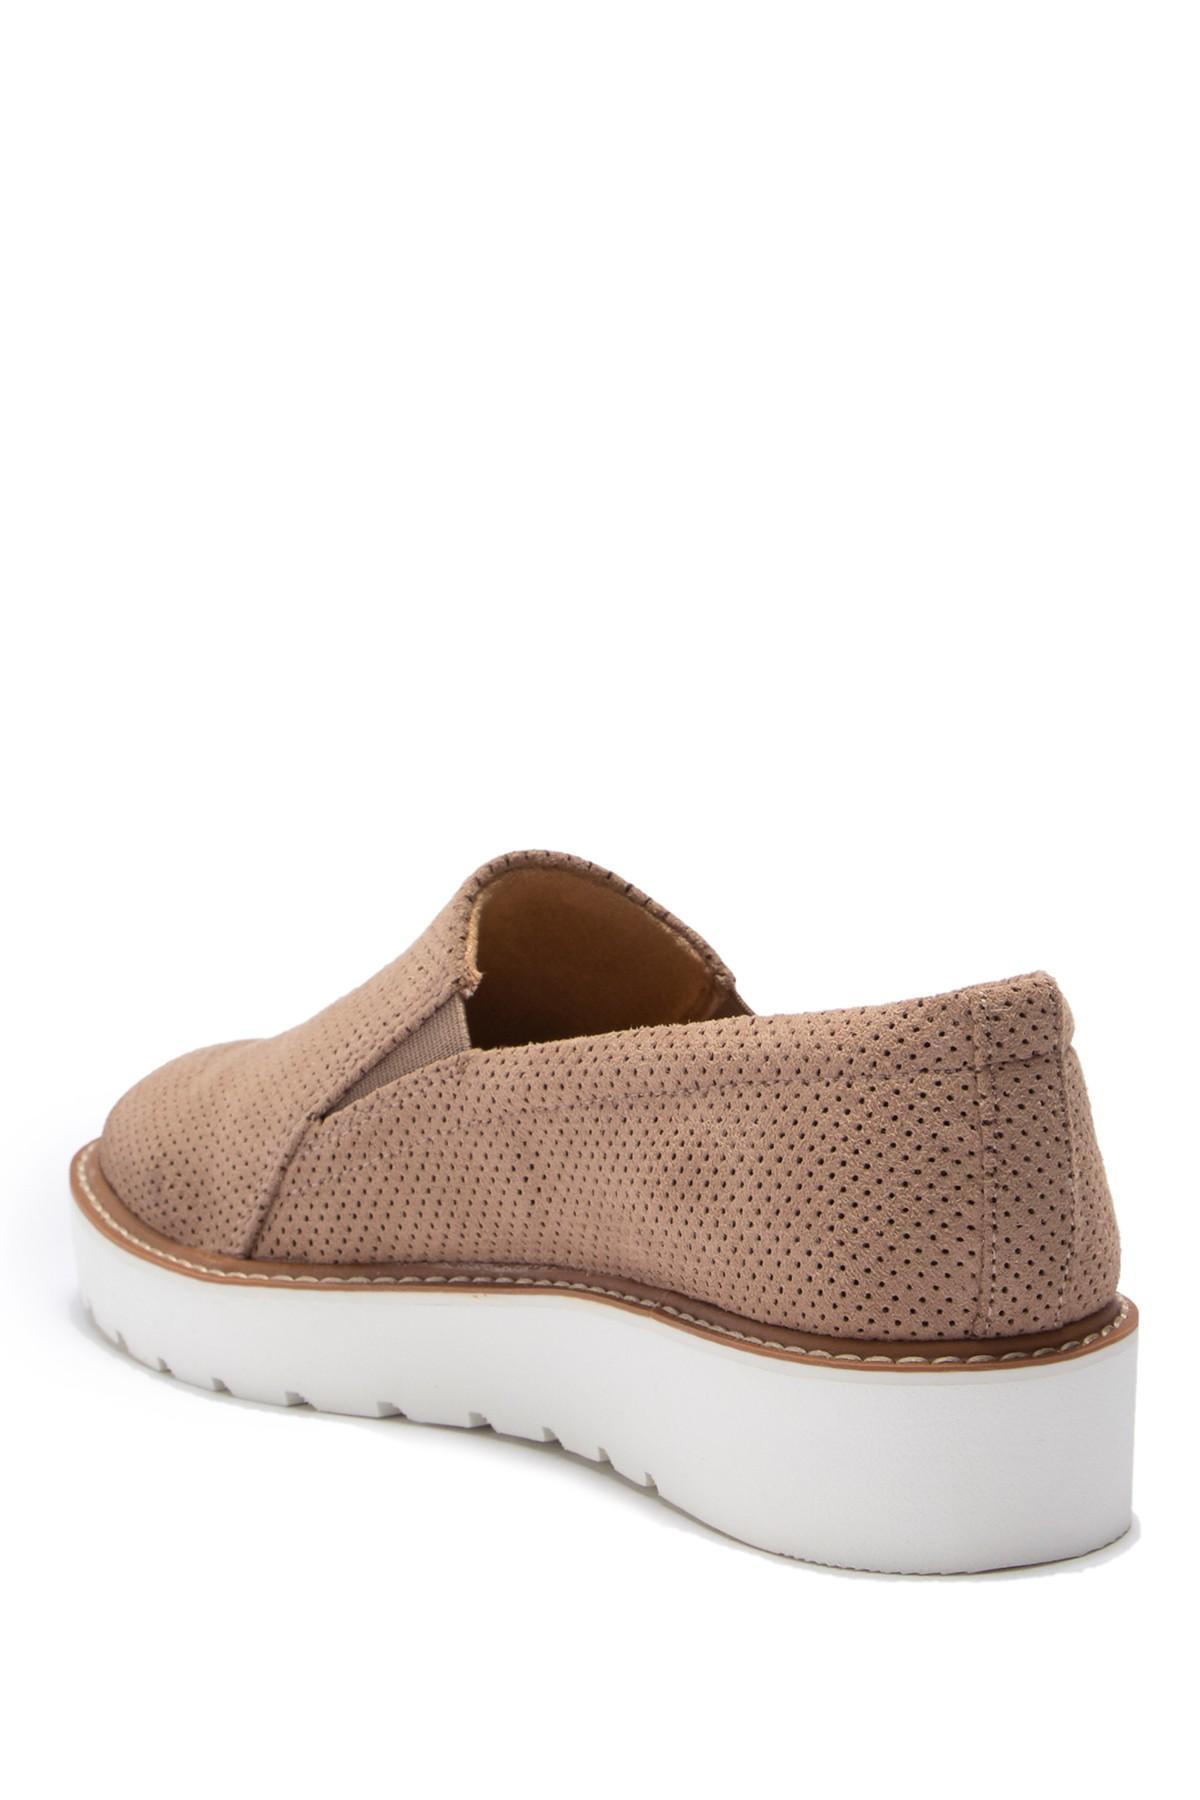 fe25c4effc49 Lyst - Naturalizer Effie Platform Perforated Slip-on Sneaker - Wide ...